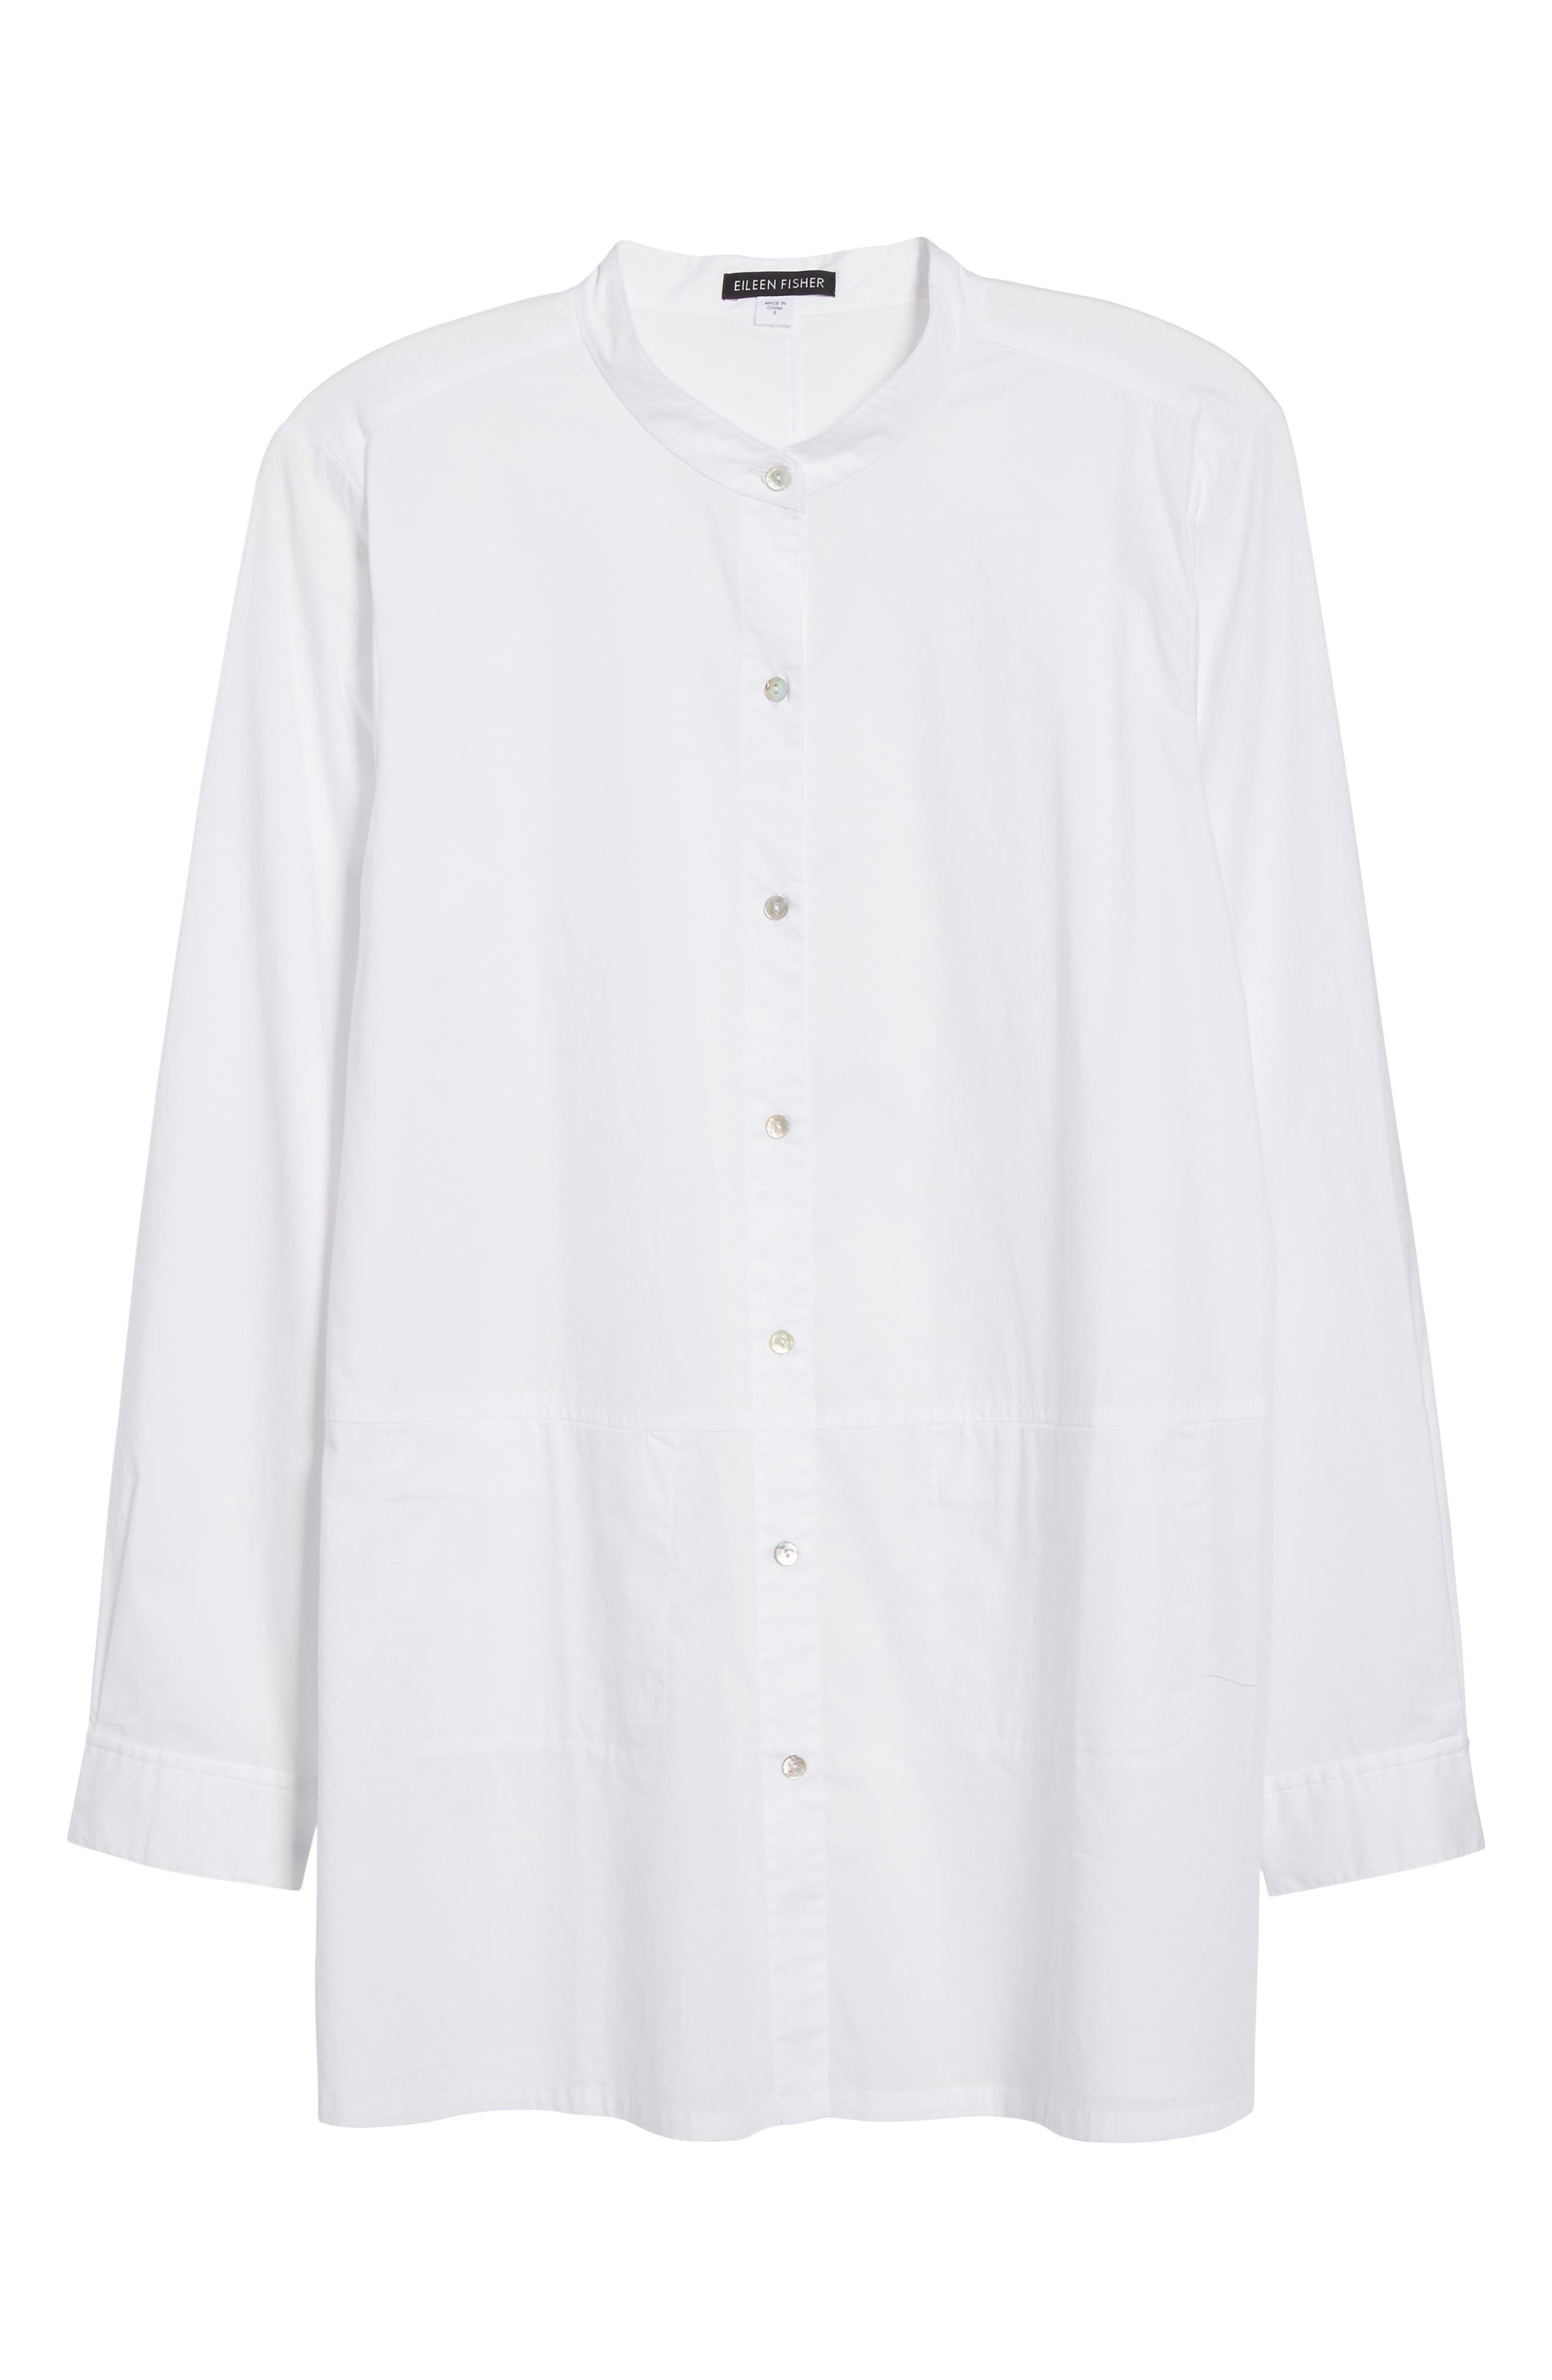 Stretch Organic Cotton Shirt,                             Alternate thumbnail 6, color,                             White